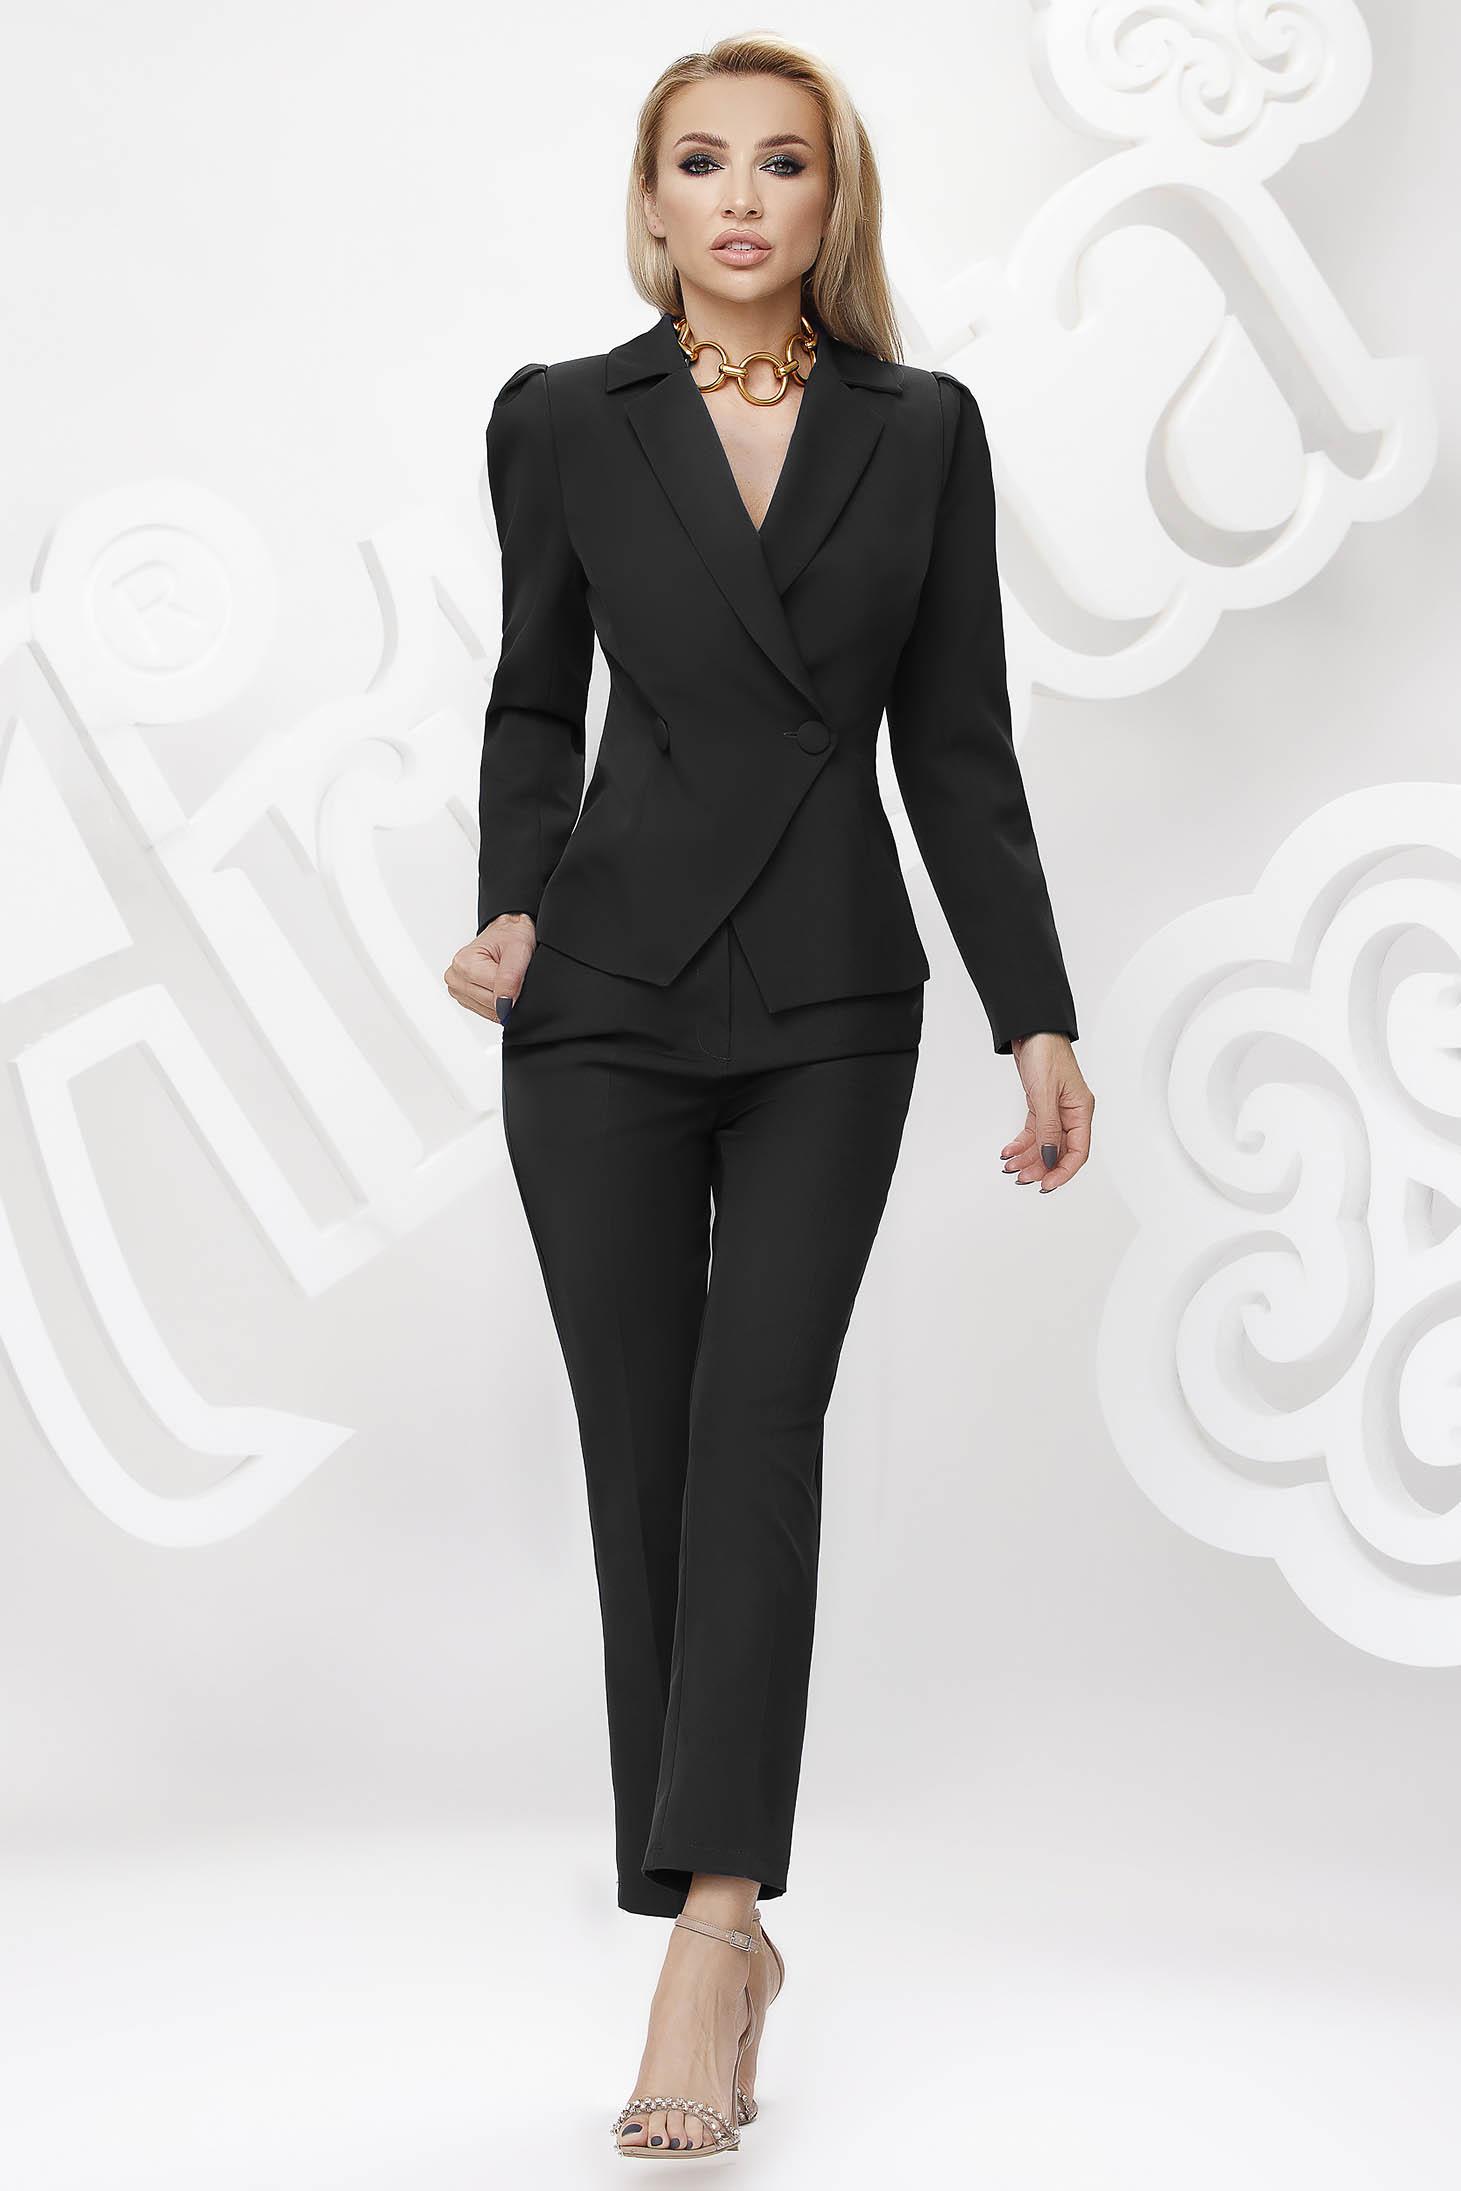 Fekete irodai női kosztüm